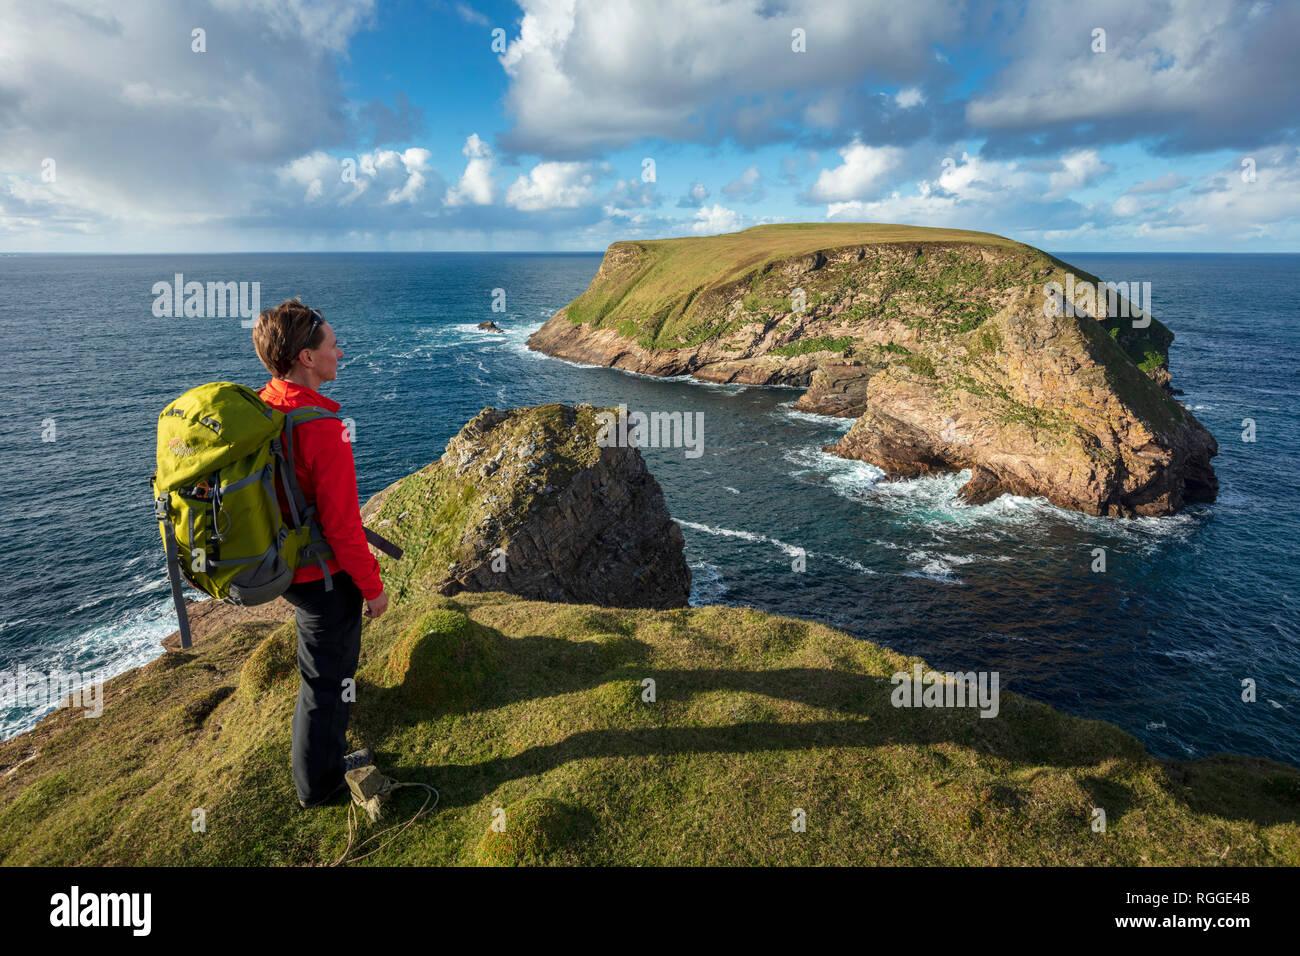 Coastal walker looking towards Kid Island, on the Children of Lir coast walk. Carrowteige, County Mayo, Ireland. - Stock Image